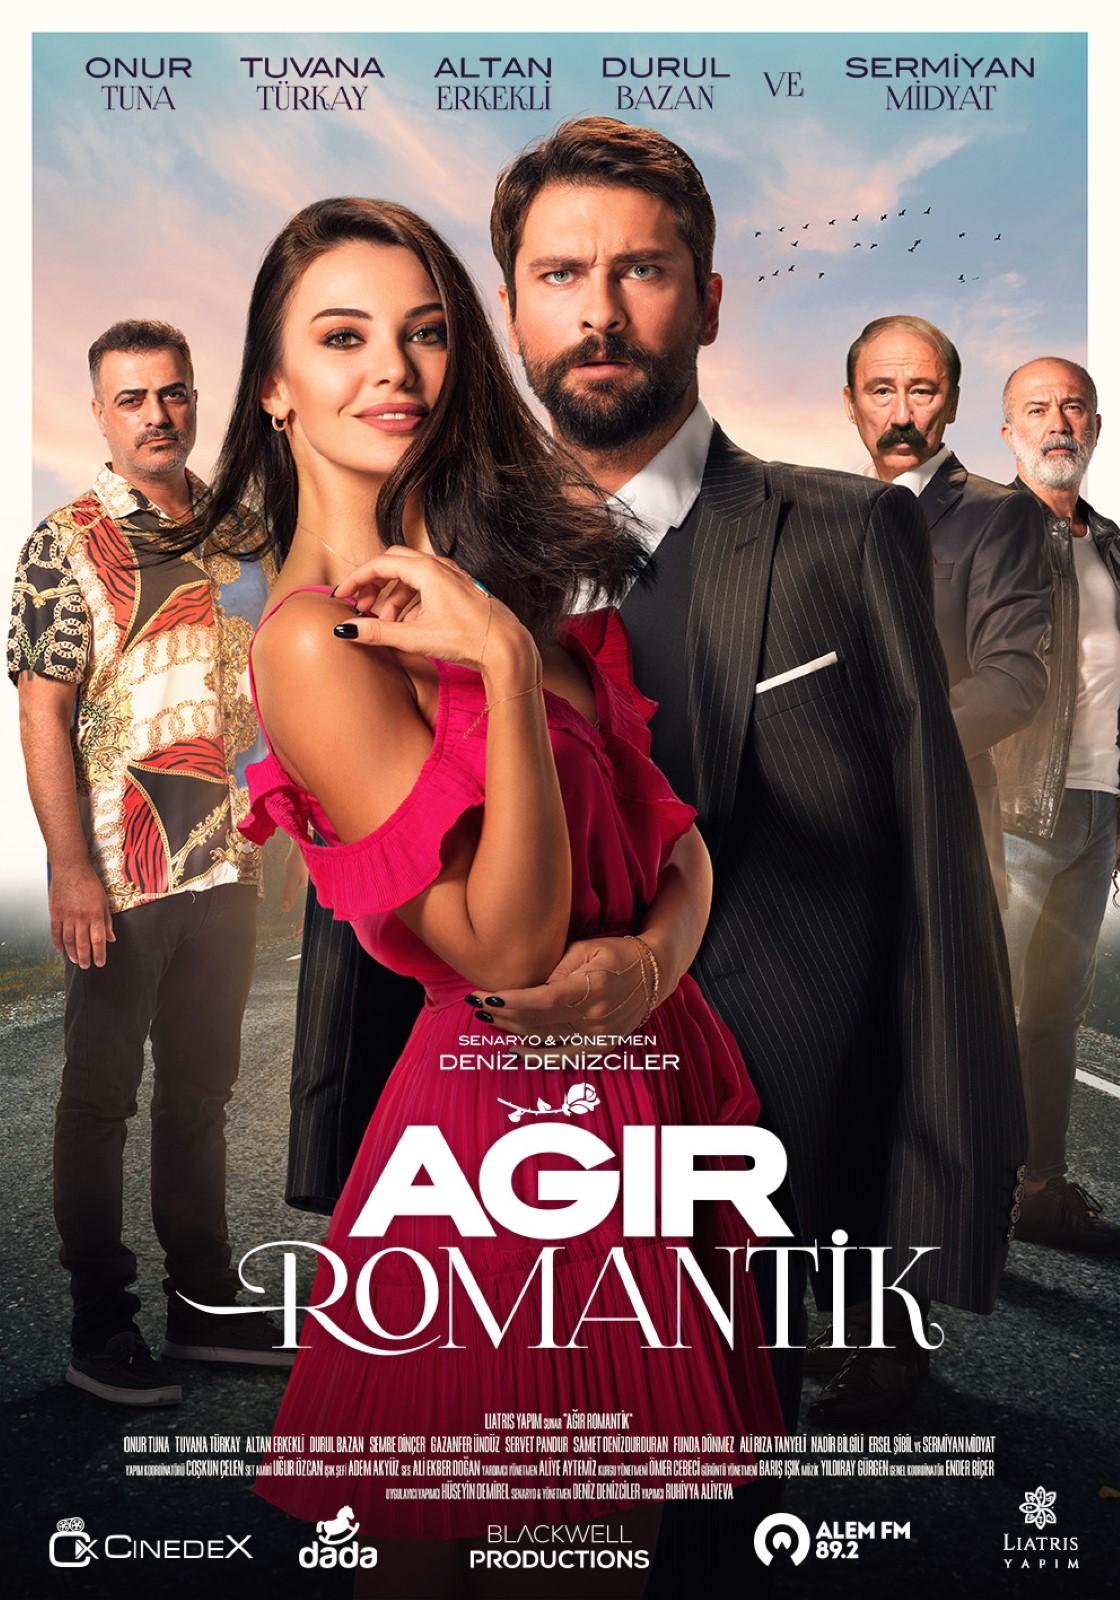 Filme 2019 Romantik